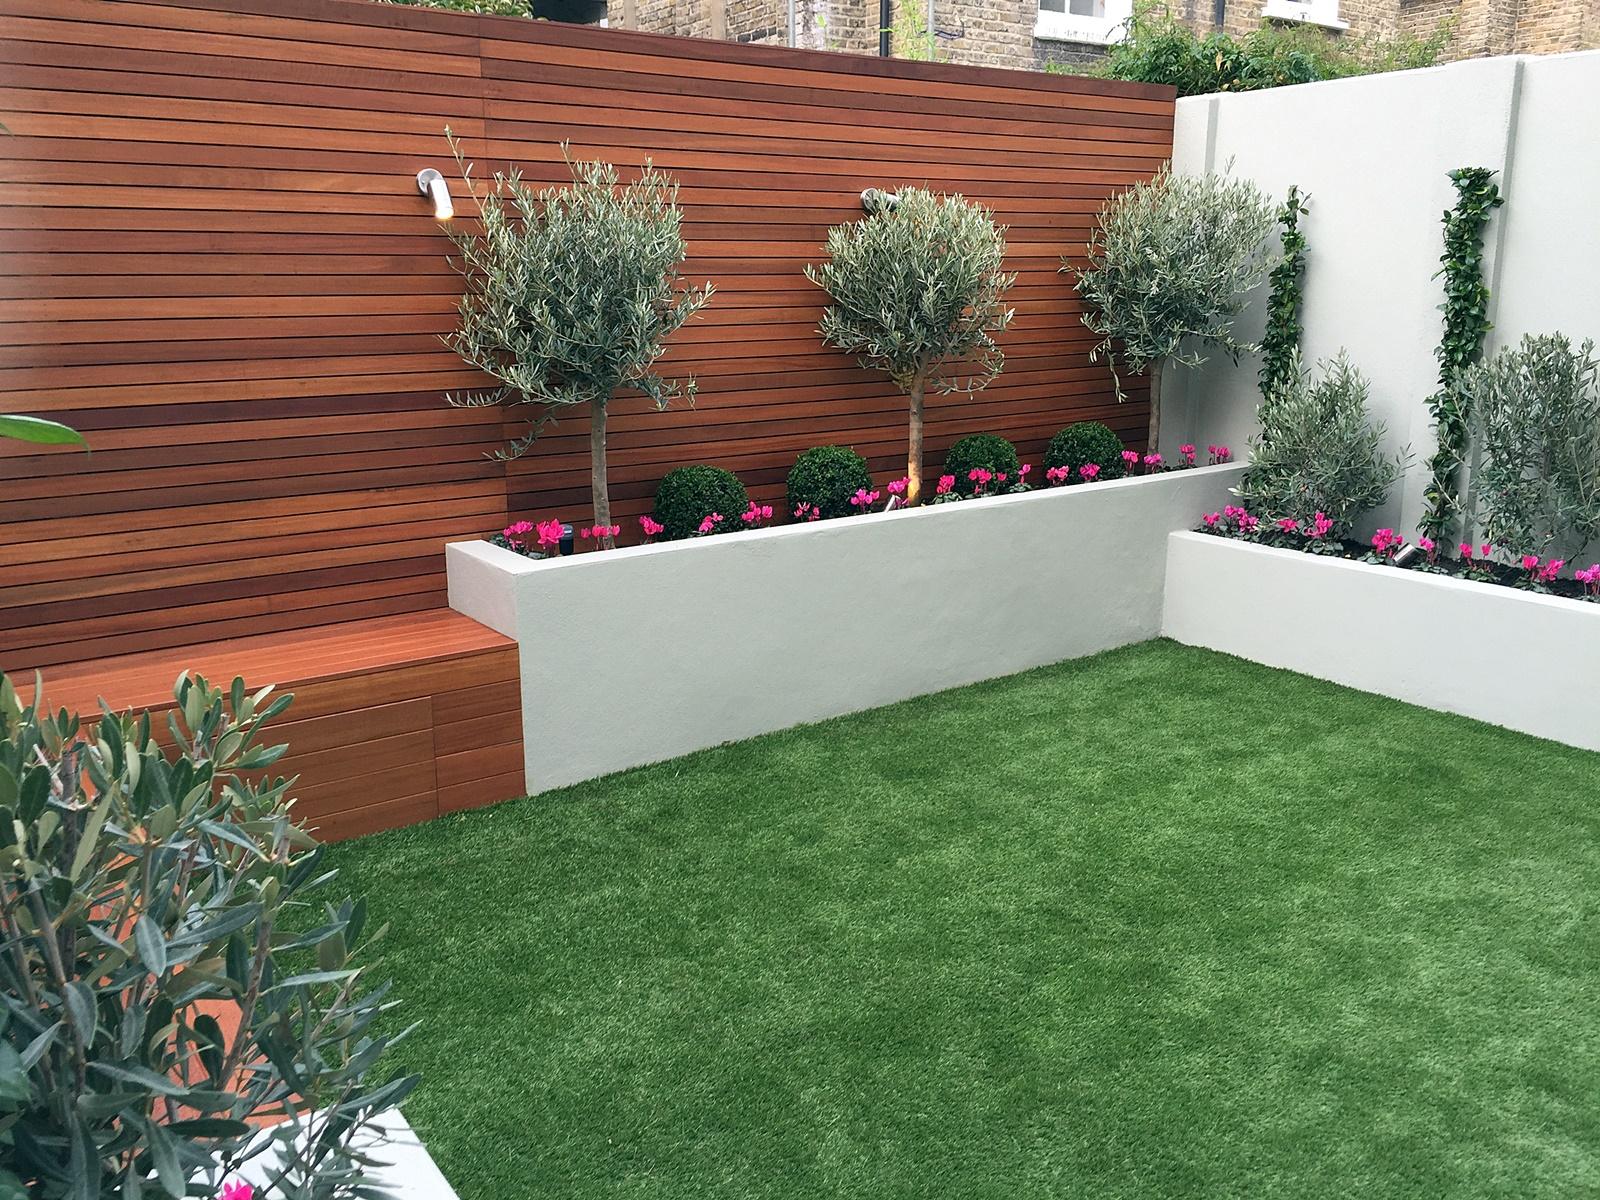 Designer london garden blog for Garden ideas with decking and grass